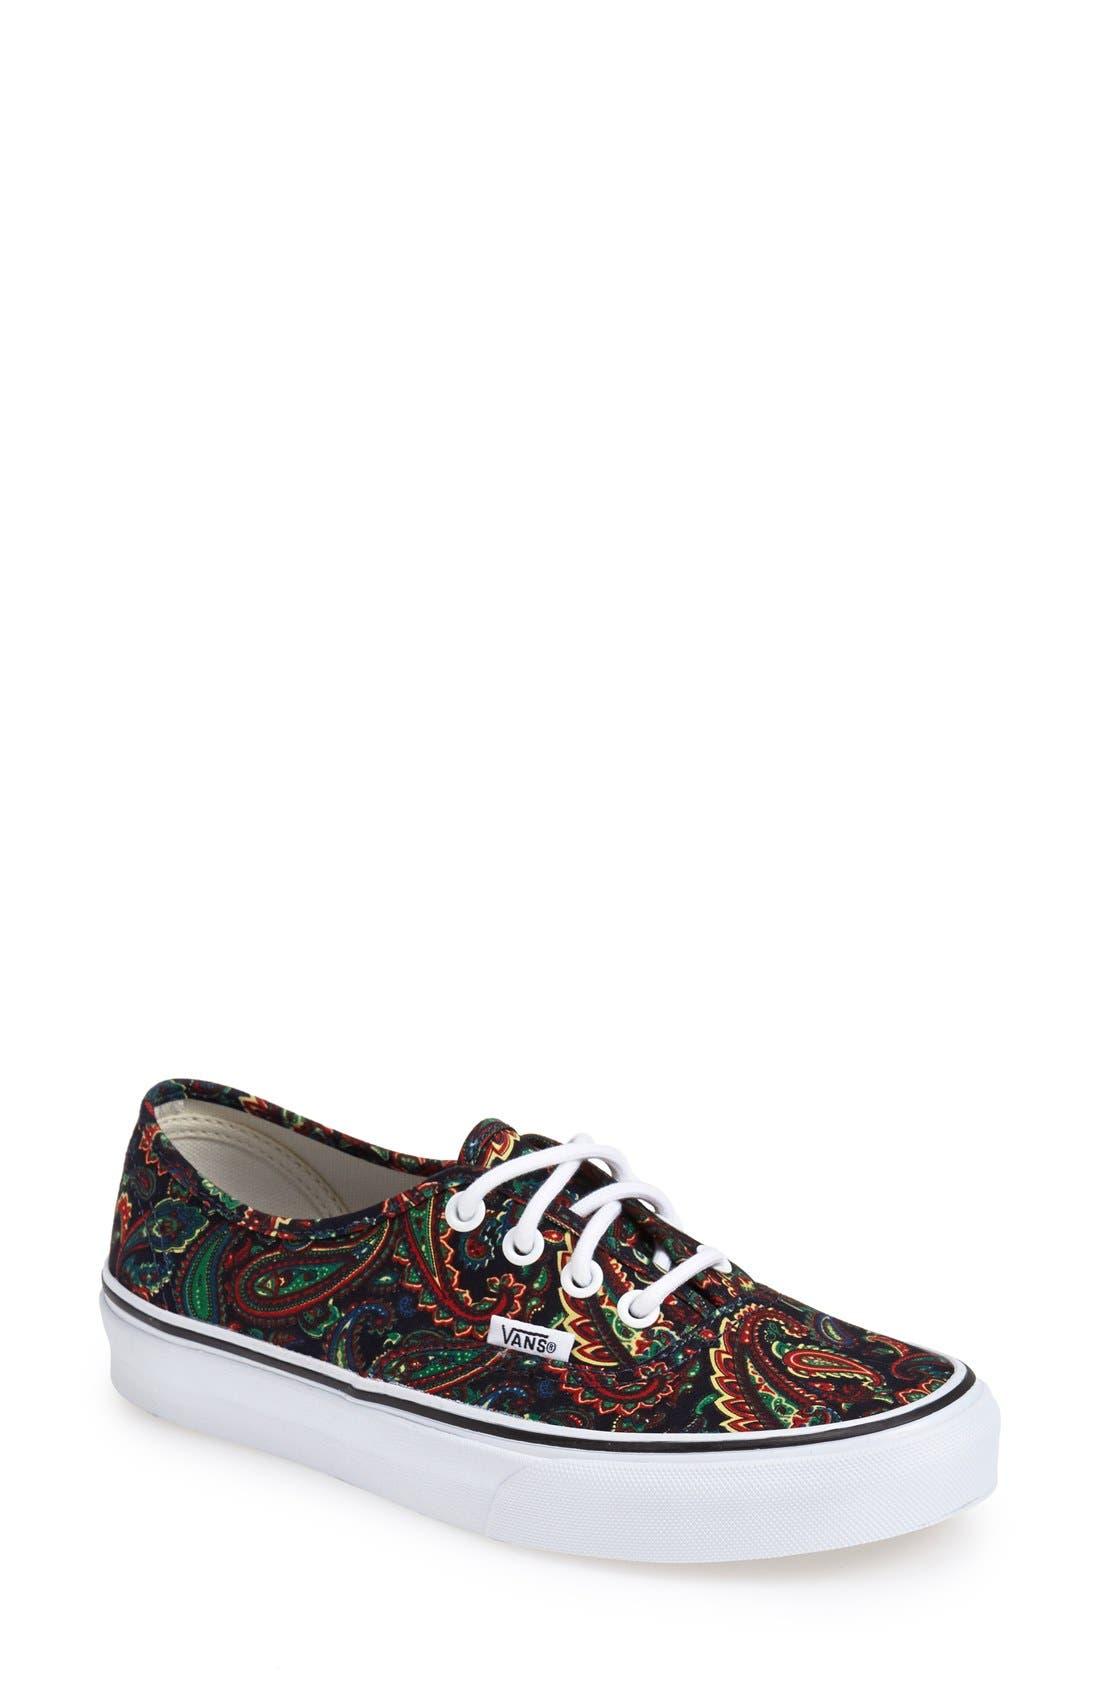 Main Image - Vans Authentic Paisley Print Sneaker (Women)